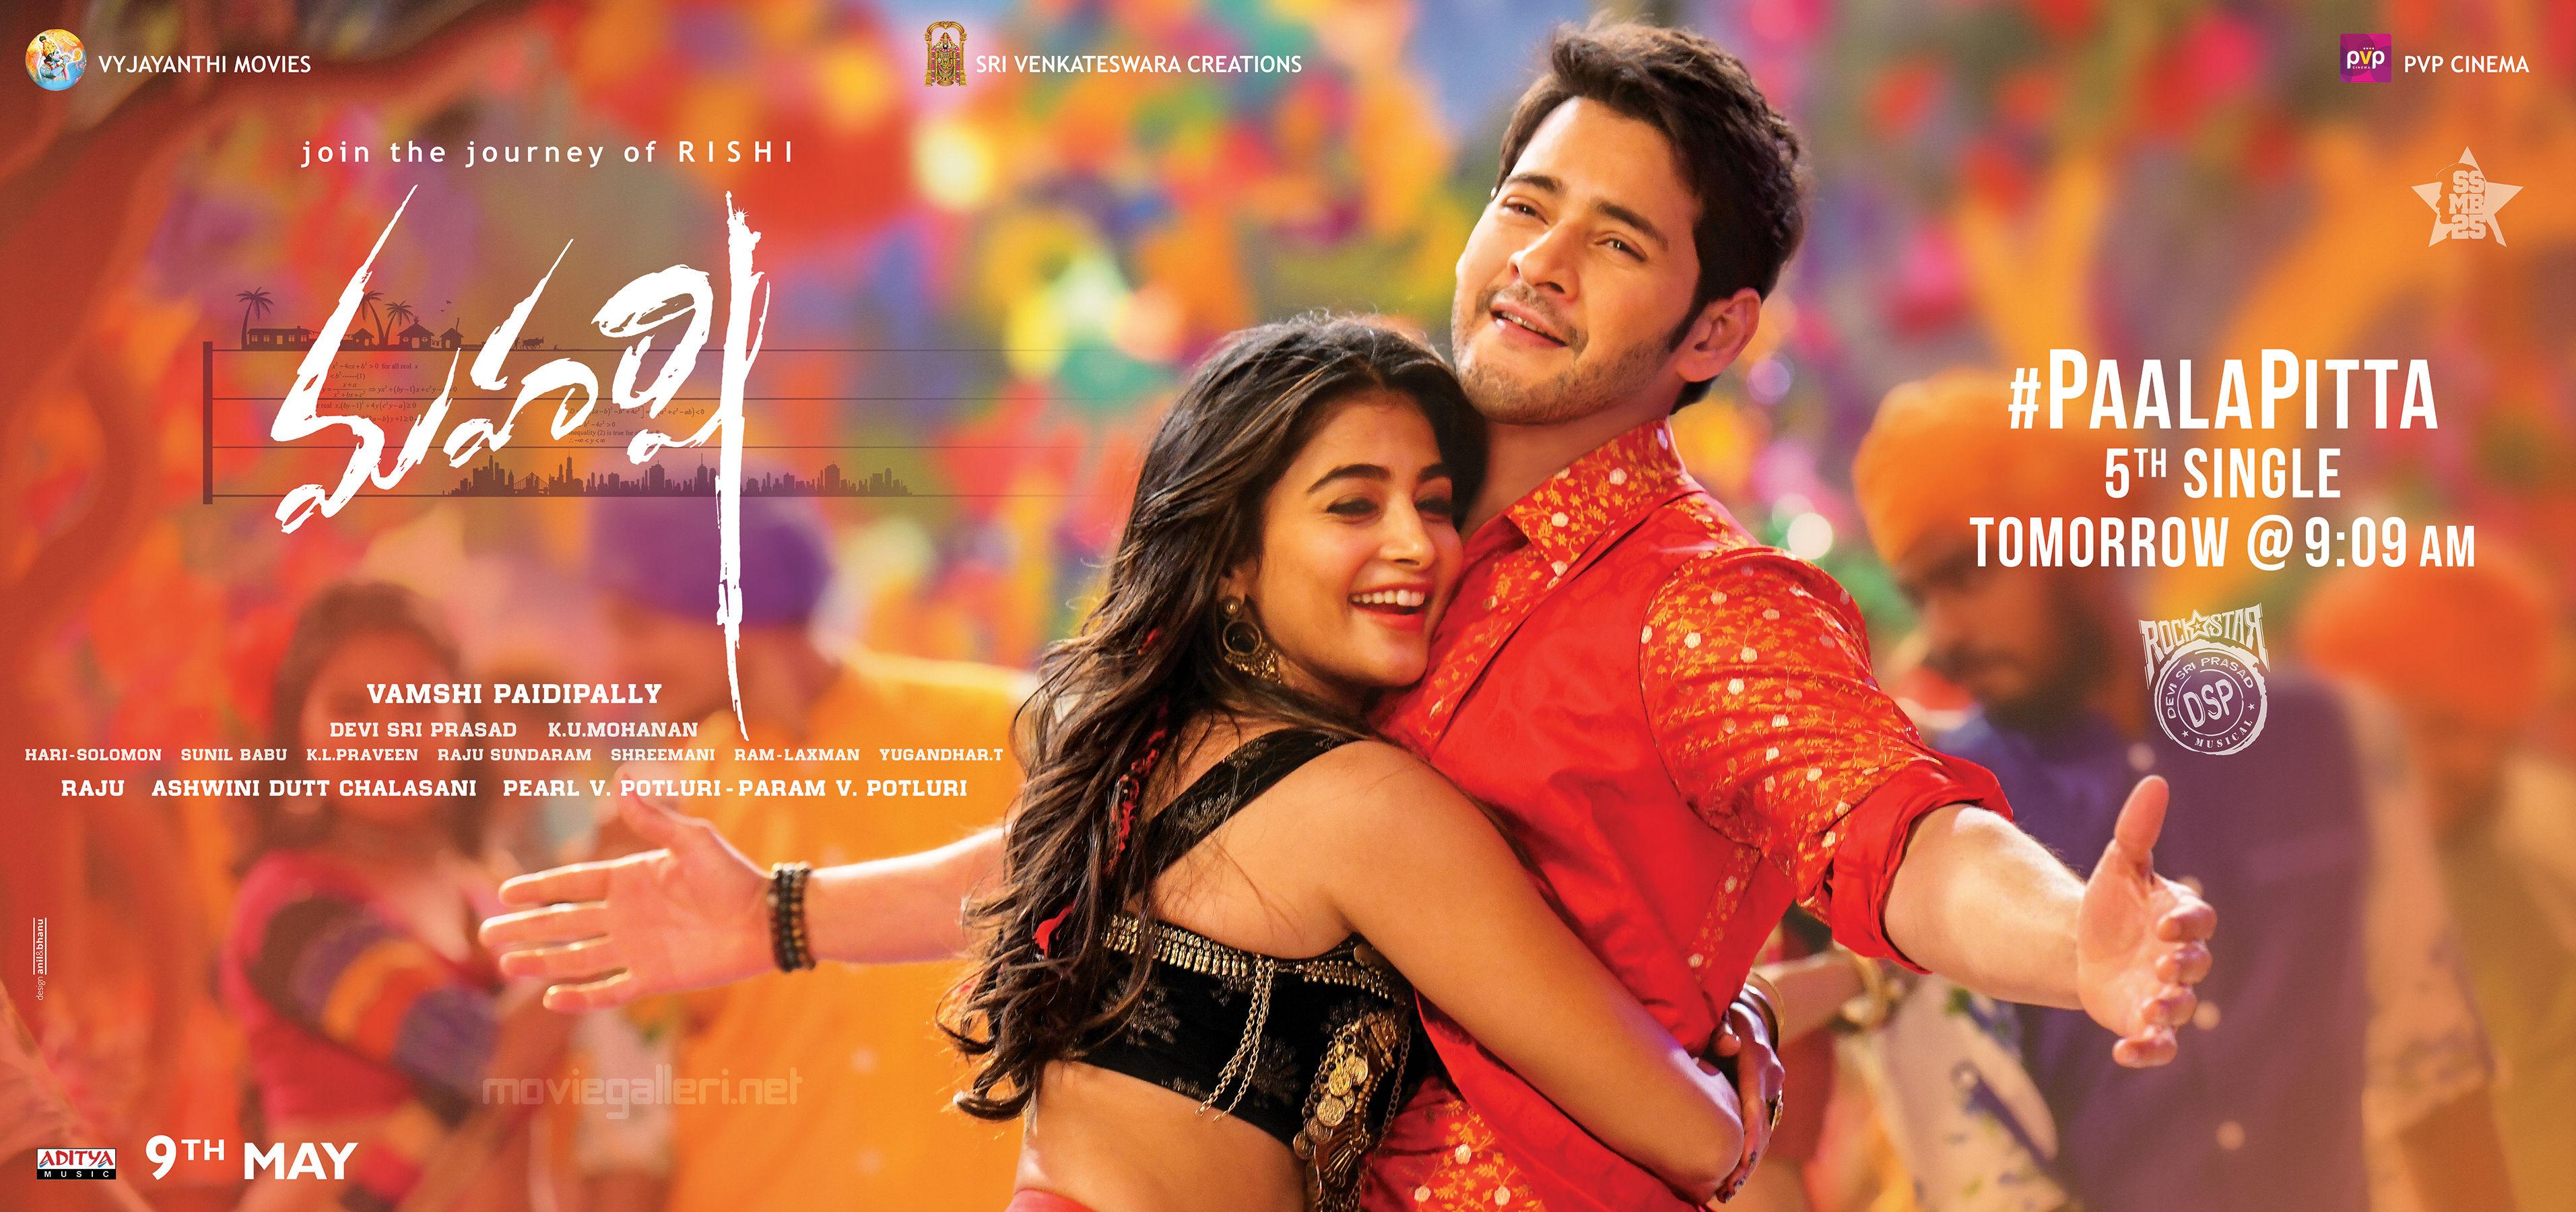 Pooja Hegde Mahesh Babu Maharshi Pala Pitta Song from Tomorrow Poster HD